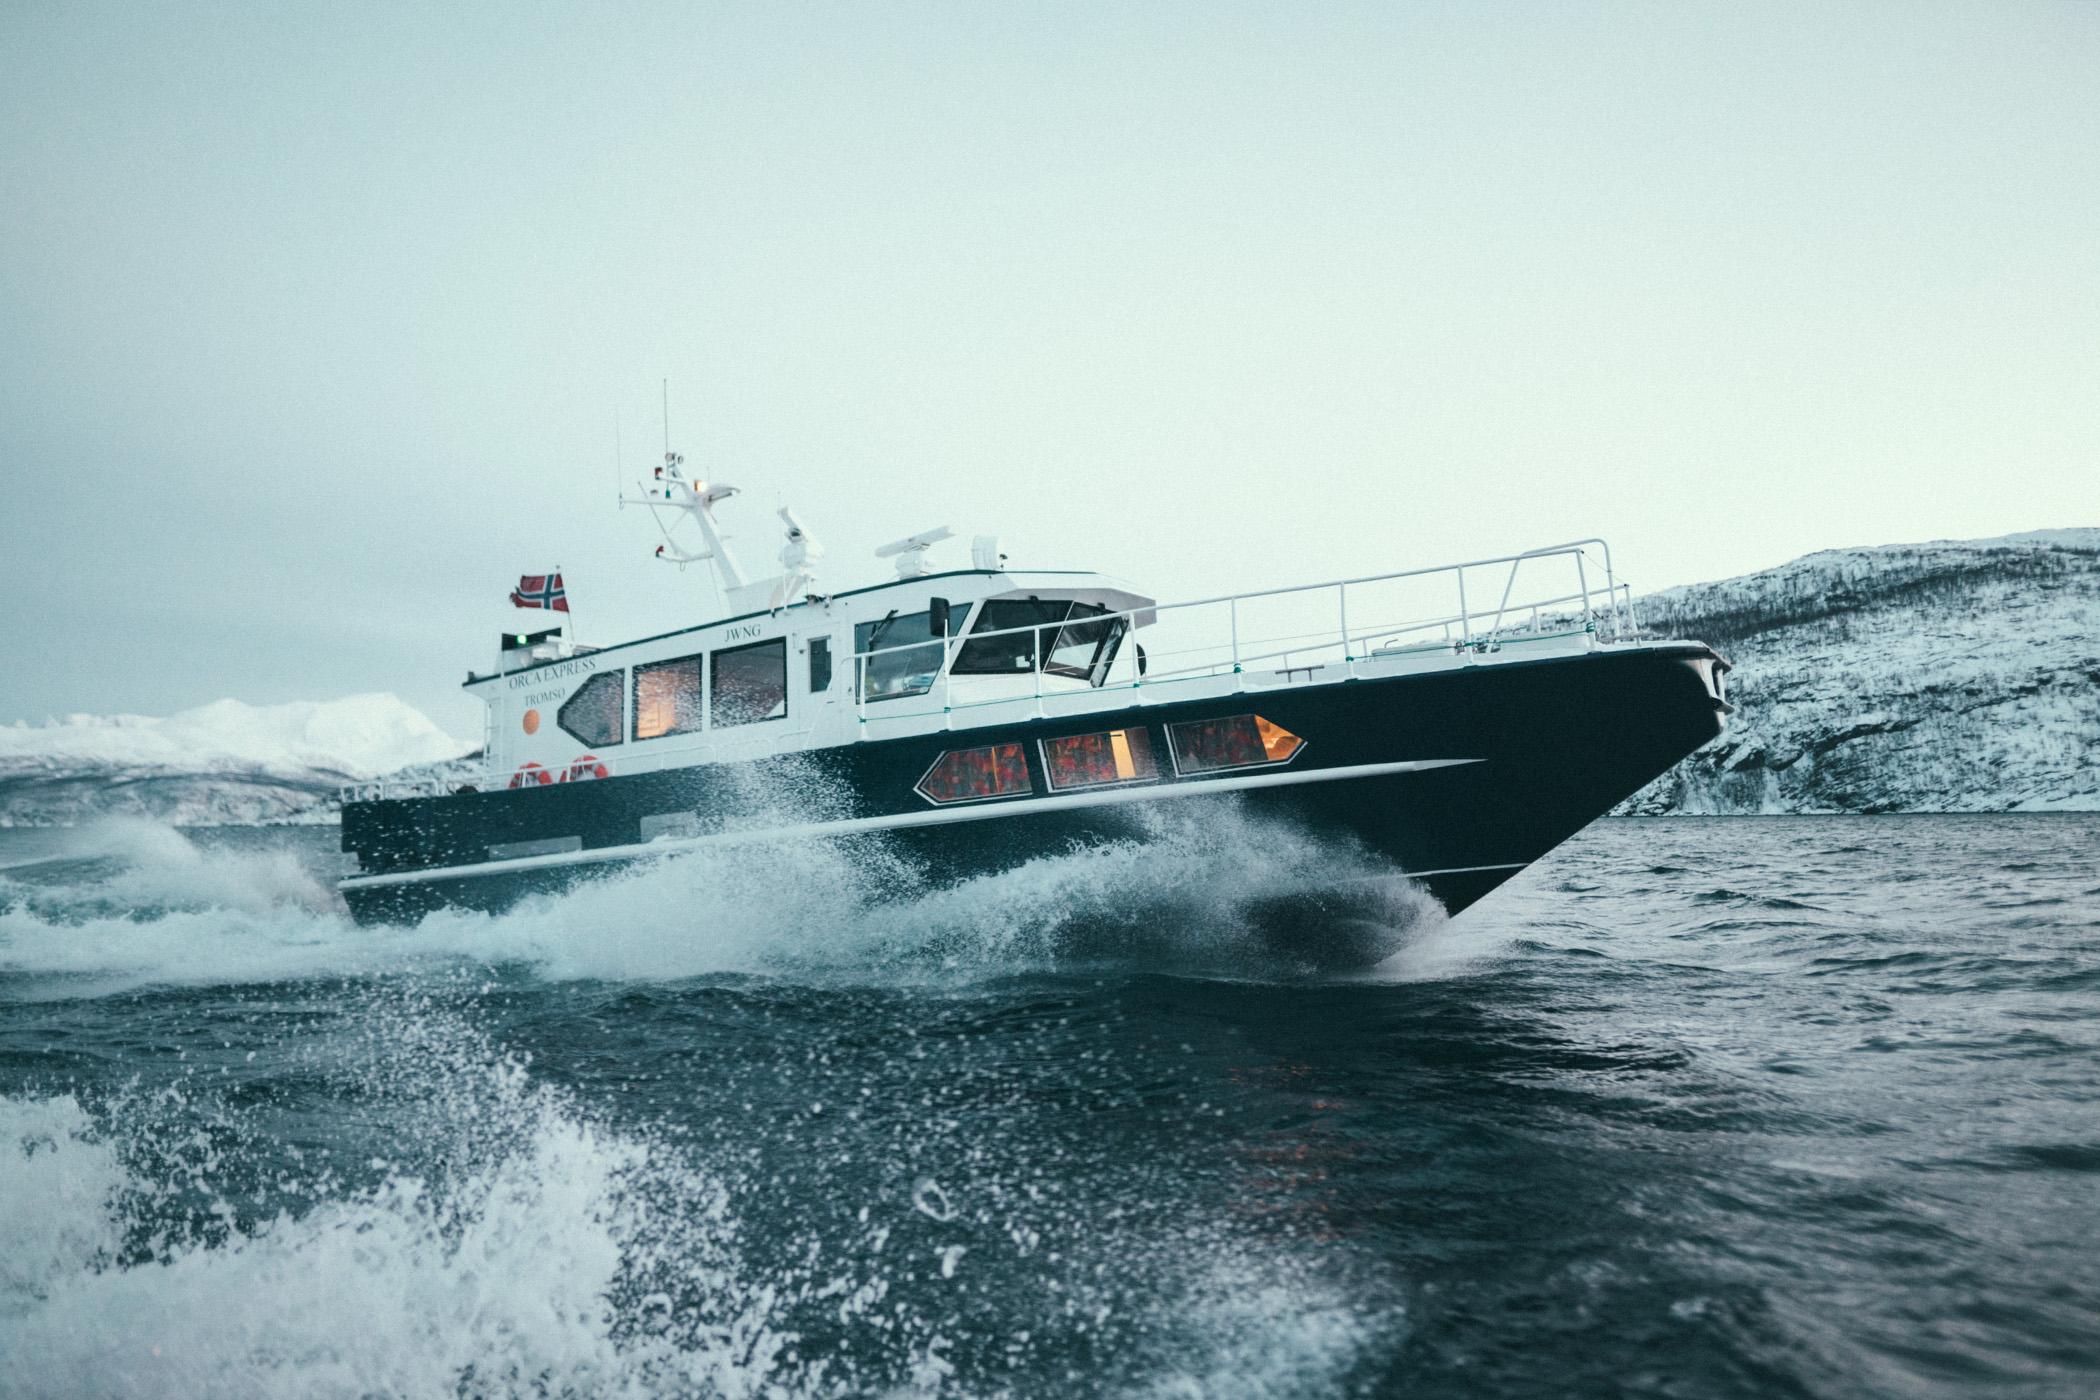 Arctic Adventure Tours, Orca Express